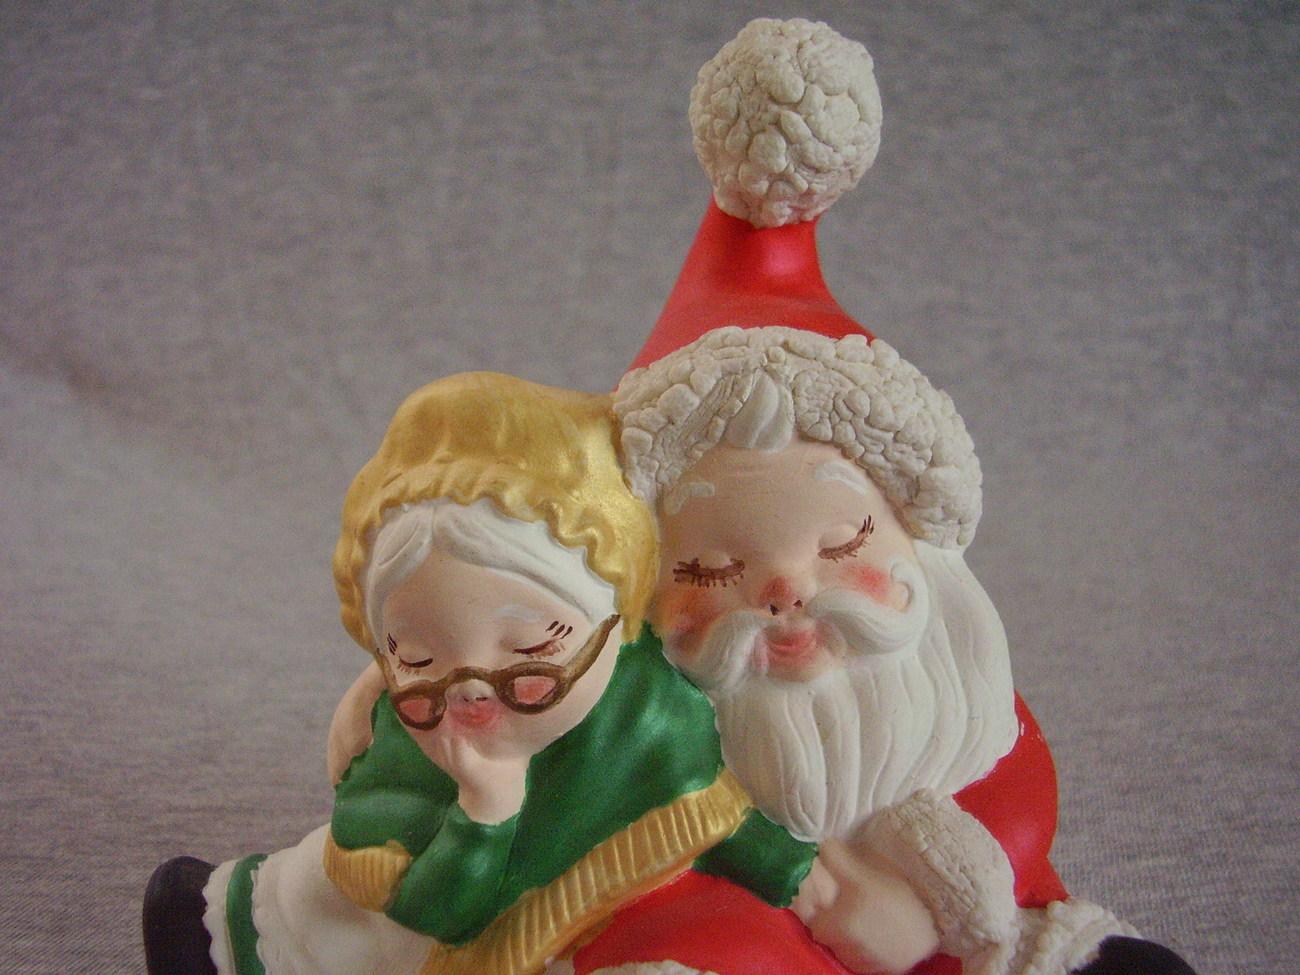 Small Ceramic Sleeping Mr and Mrs Claus Santa Figurine Statu